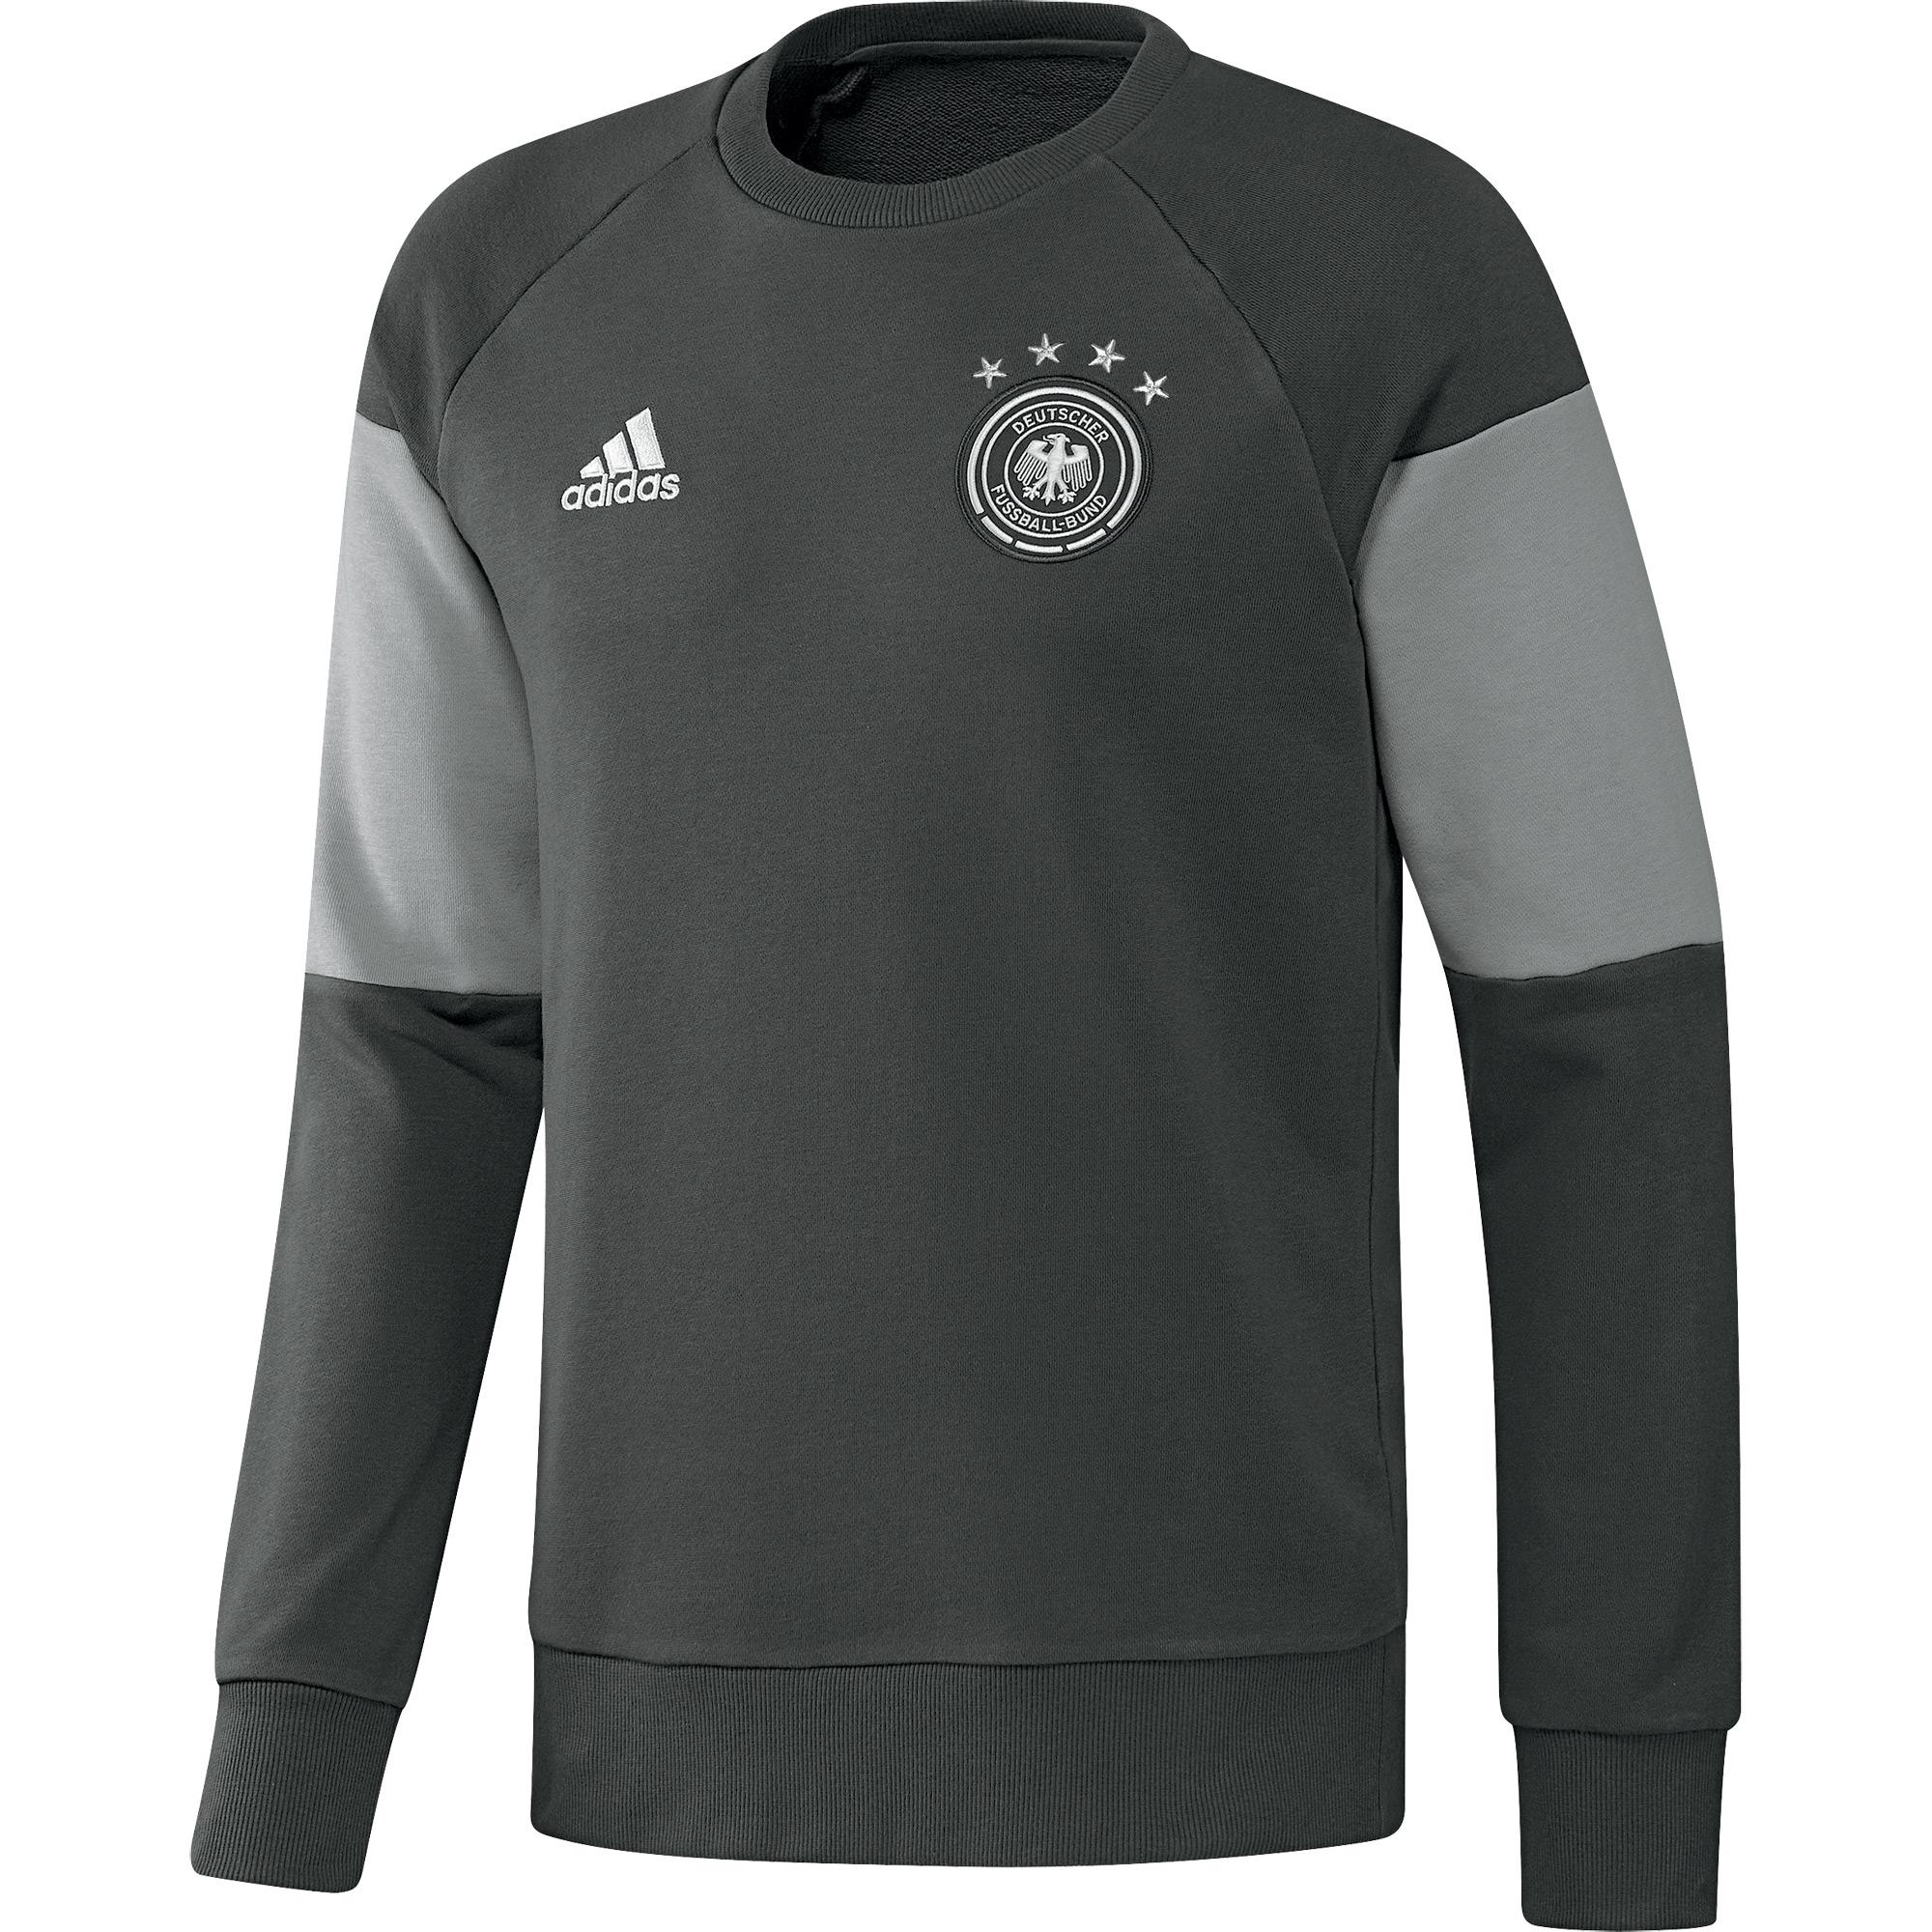 Duitsland Sweat Top 2016-2017